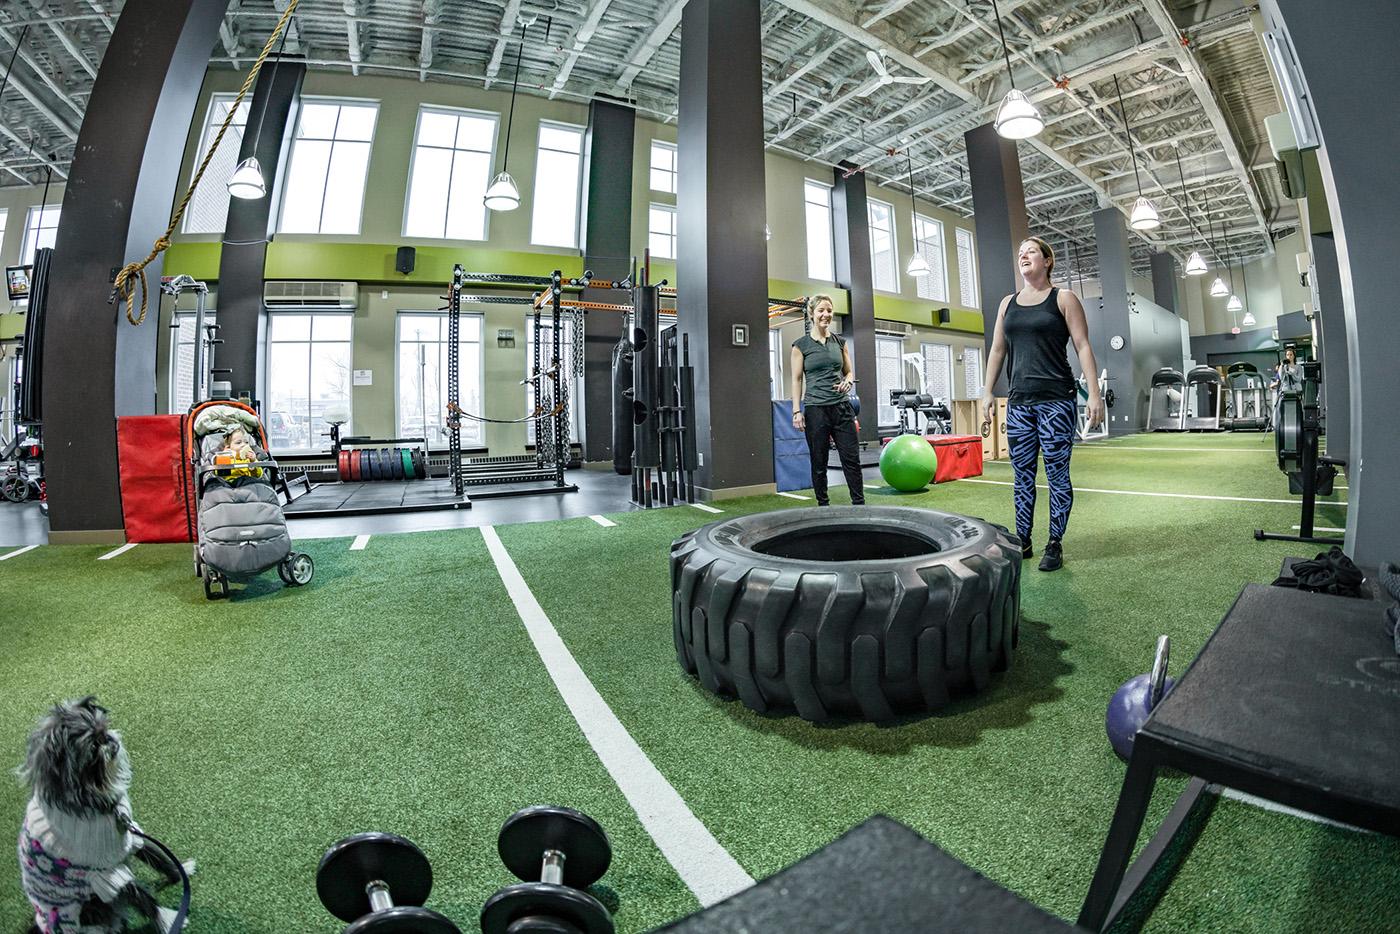 cityfit-gym-personal-training-calgary-workout-facility-inglewood-14.jpg